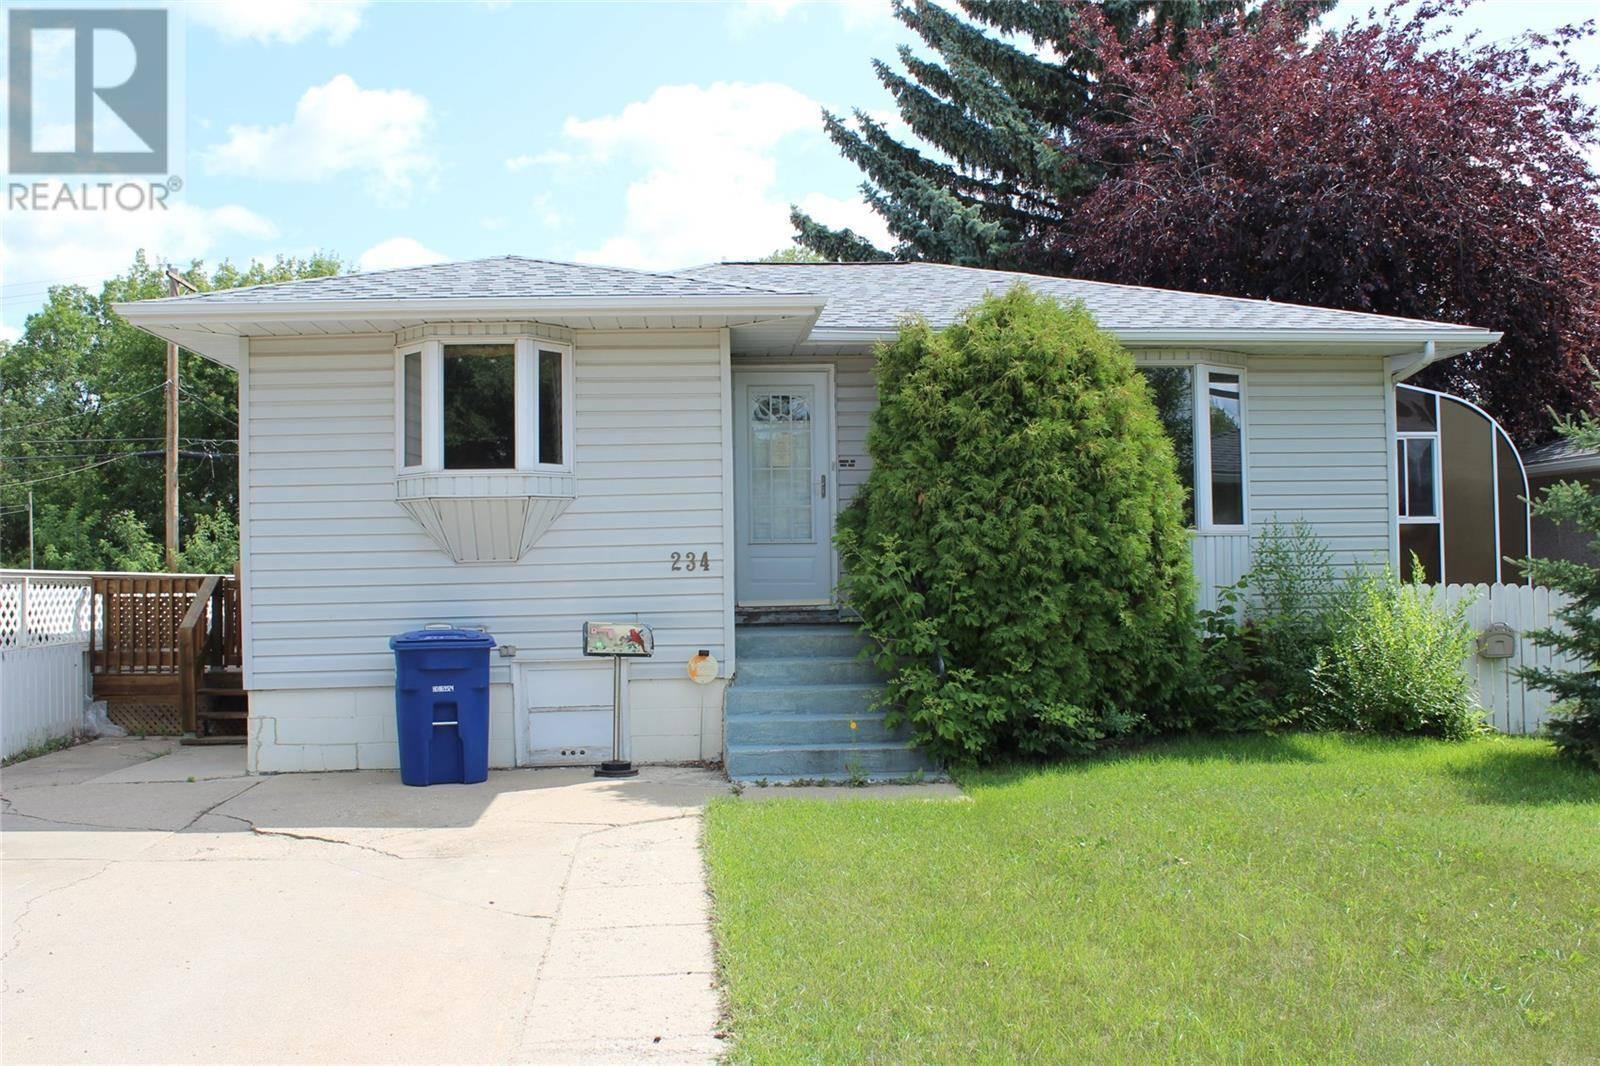 House for sale at 234 Montreal Ave N Saskatoon Saskatchewan - MLS: SK783019